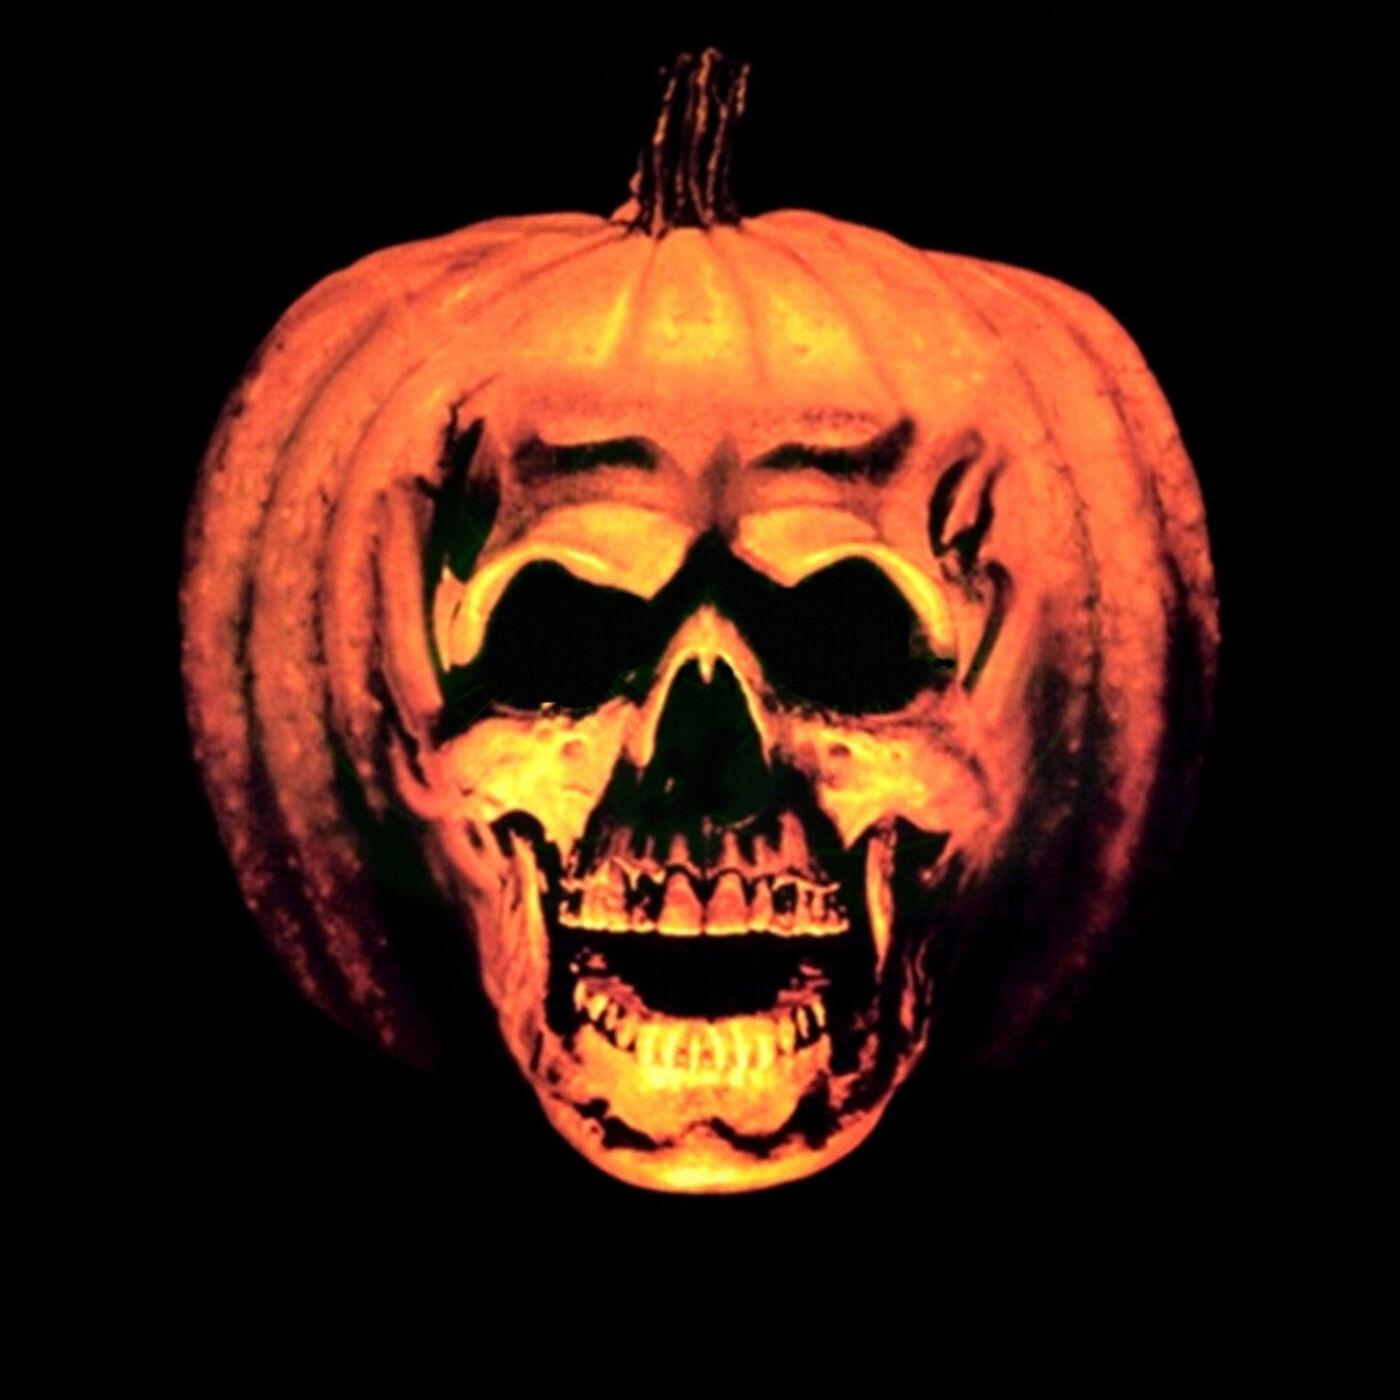 31 Days of Halloween: Halloween II (1981)